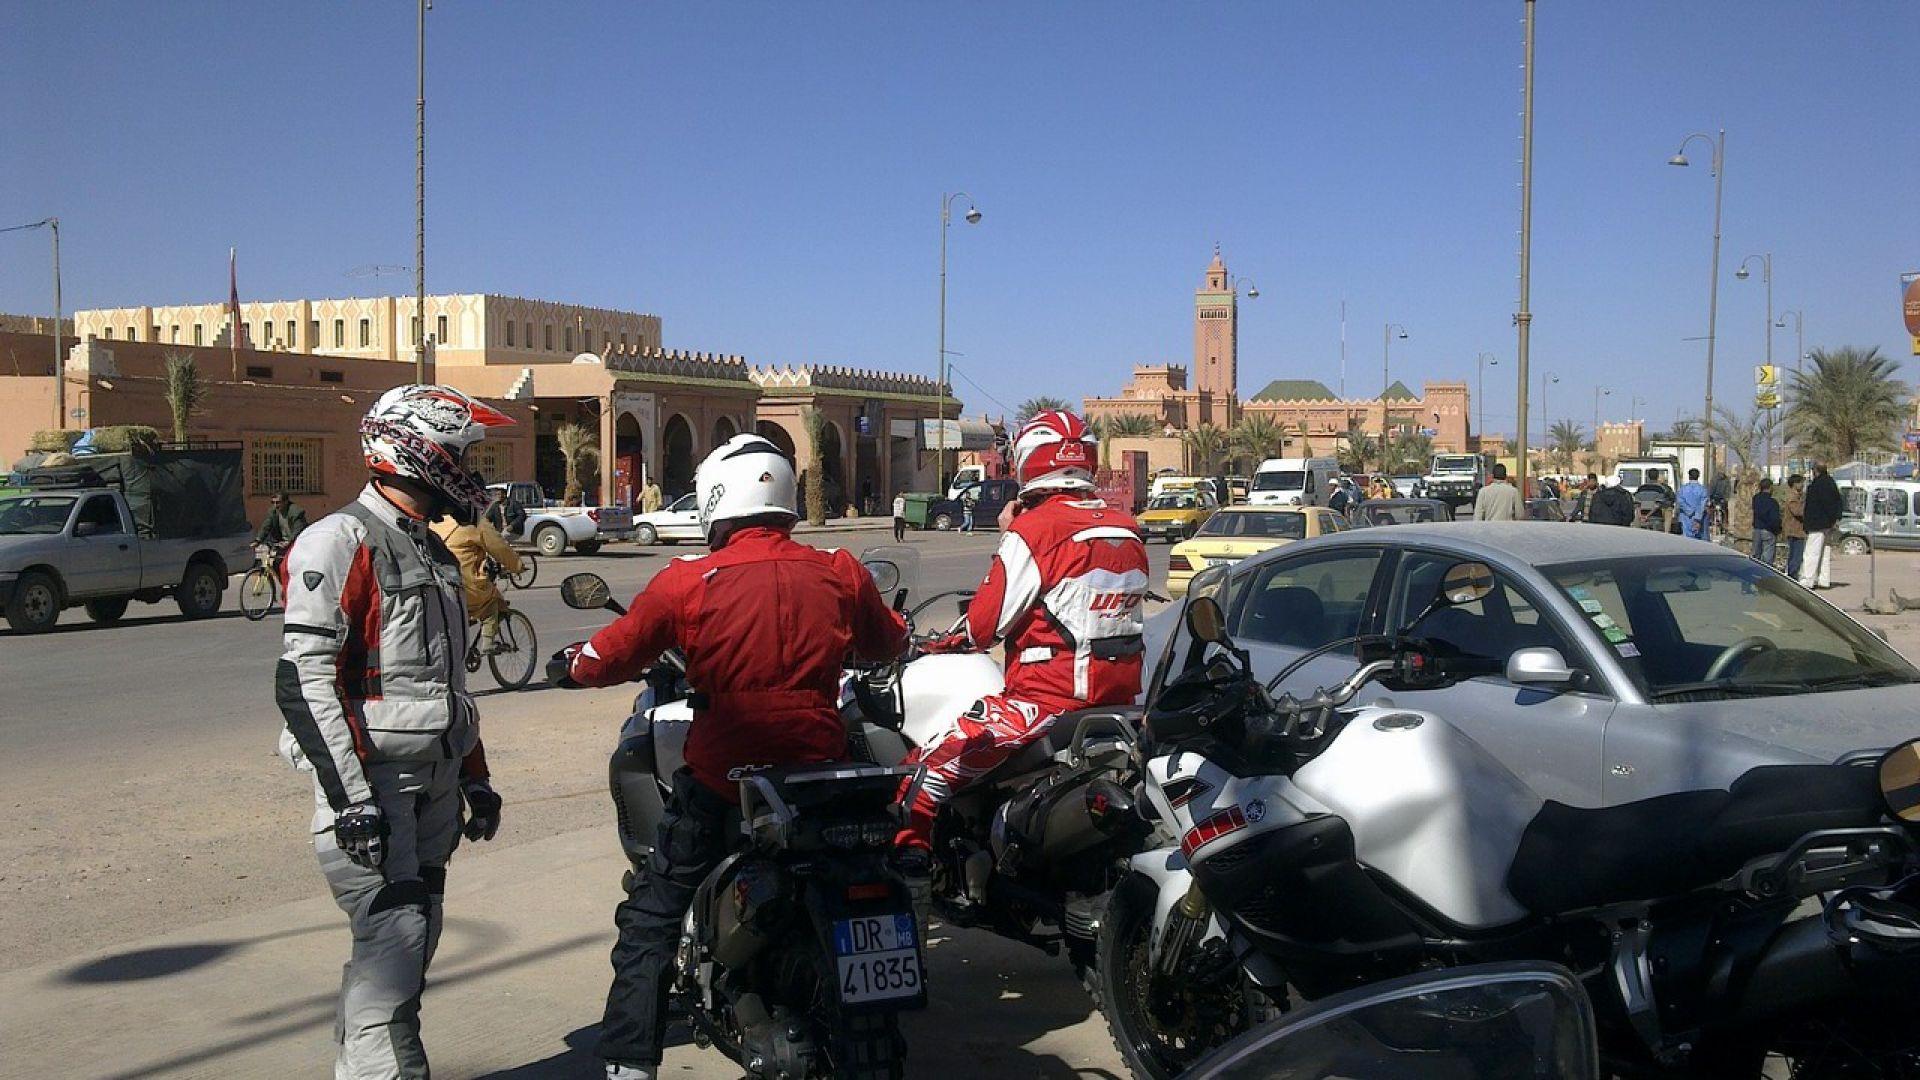 Immagine 154: In Marocco con la Yamaha Super Ténéré